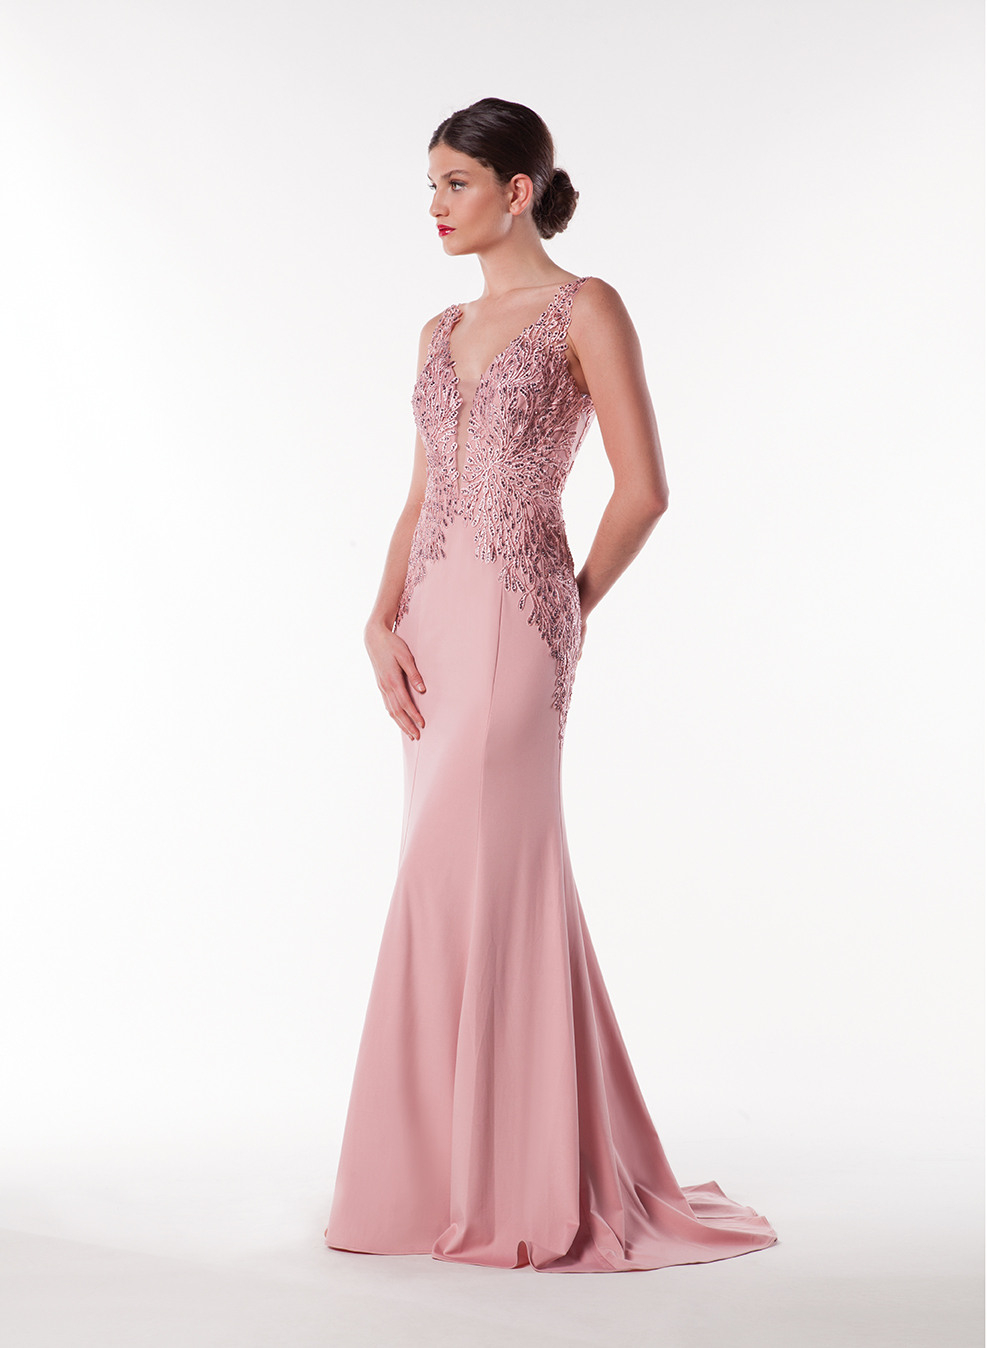 Cool Abendkleid New York Fashion Bester Preis15 Coolste Abendkleid New York Fashion Spezialgebiet